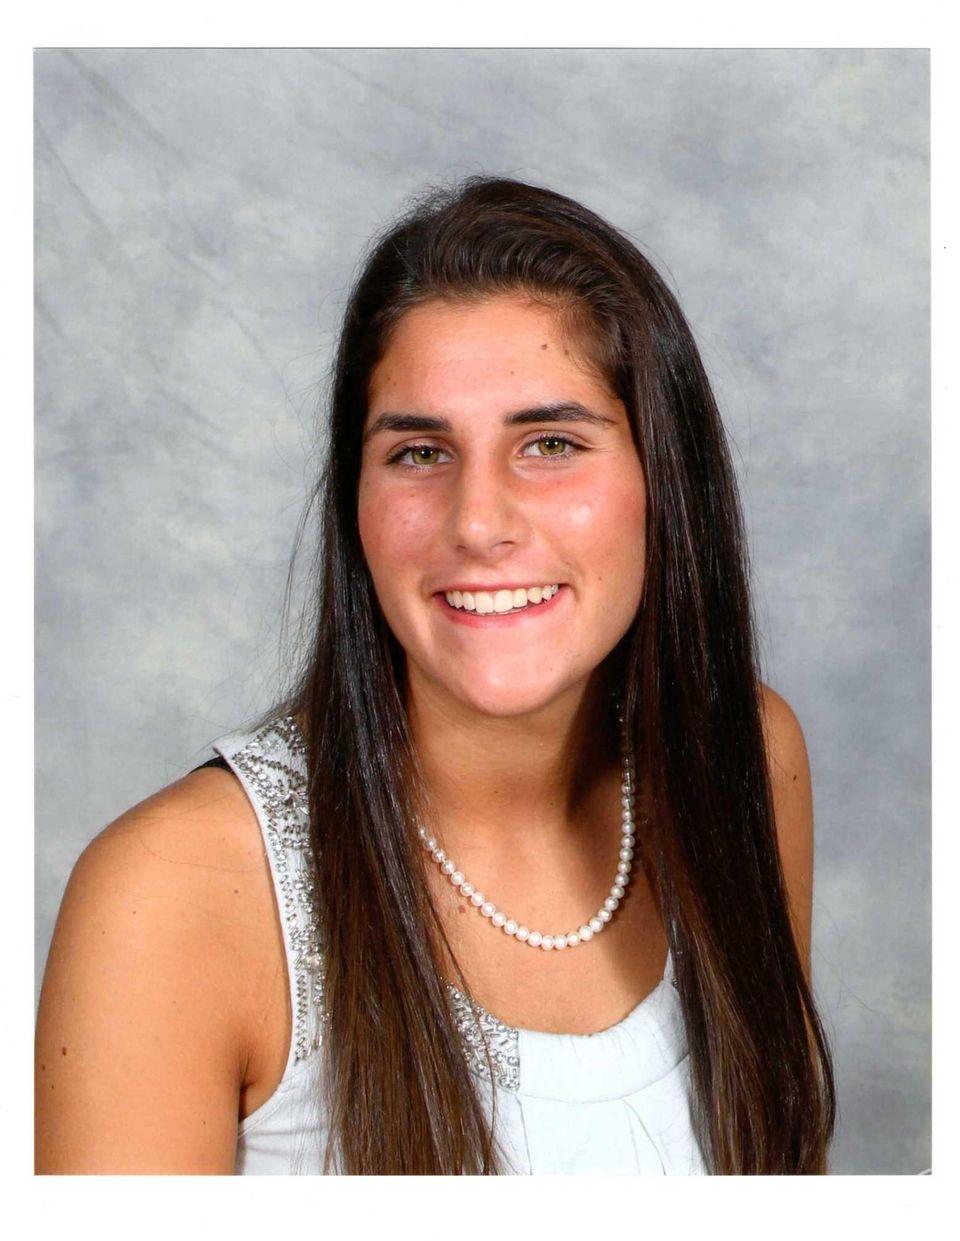 Kara Patrovic, a junior at Miller Place High